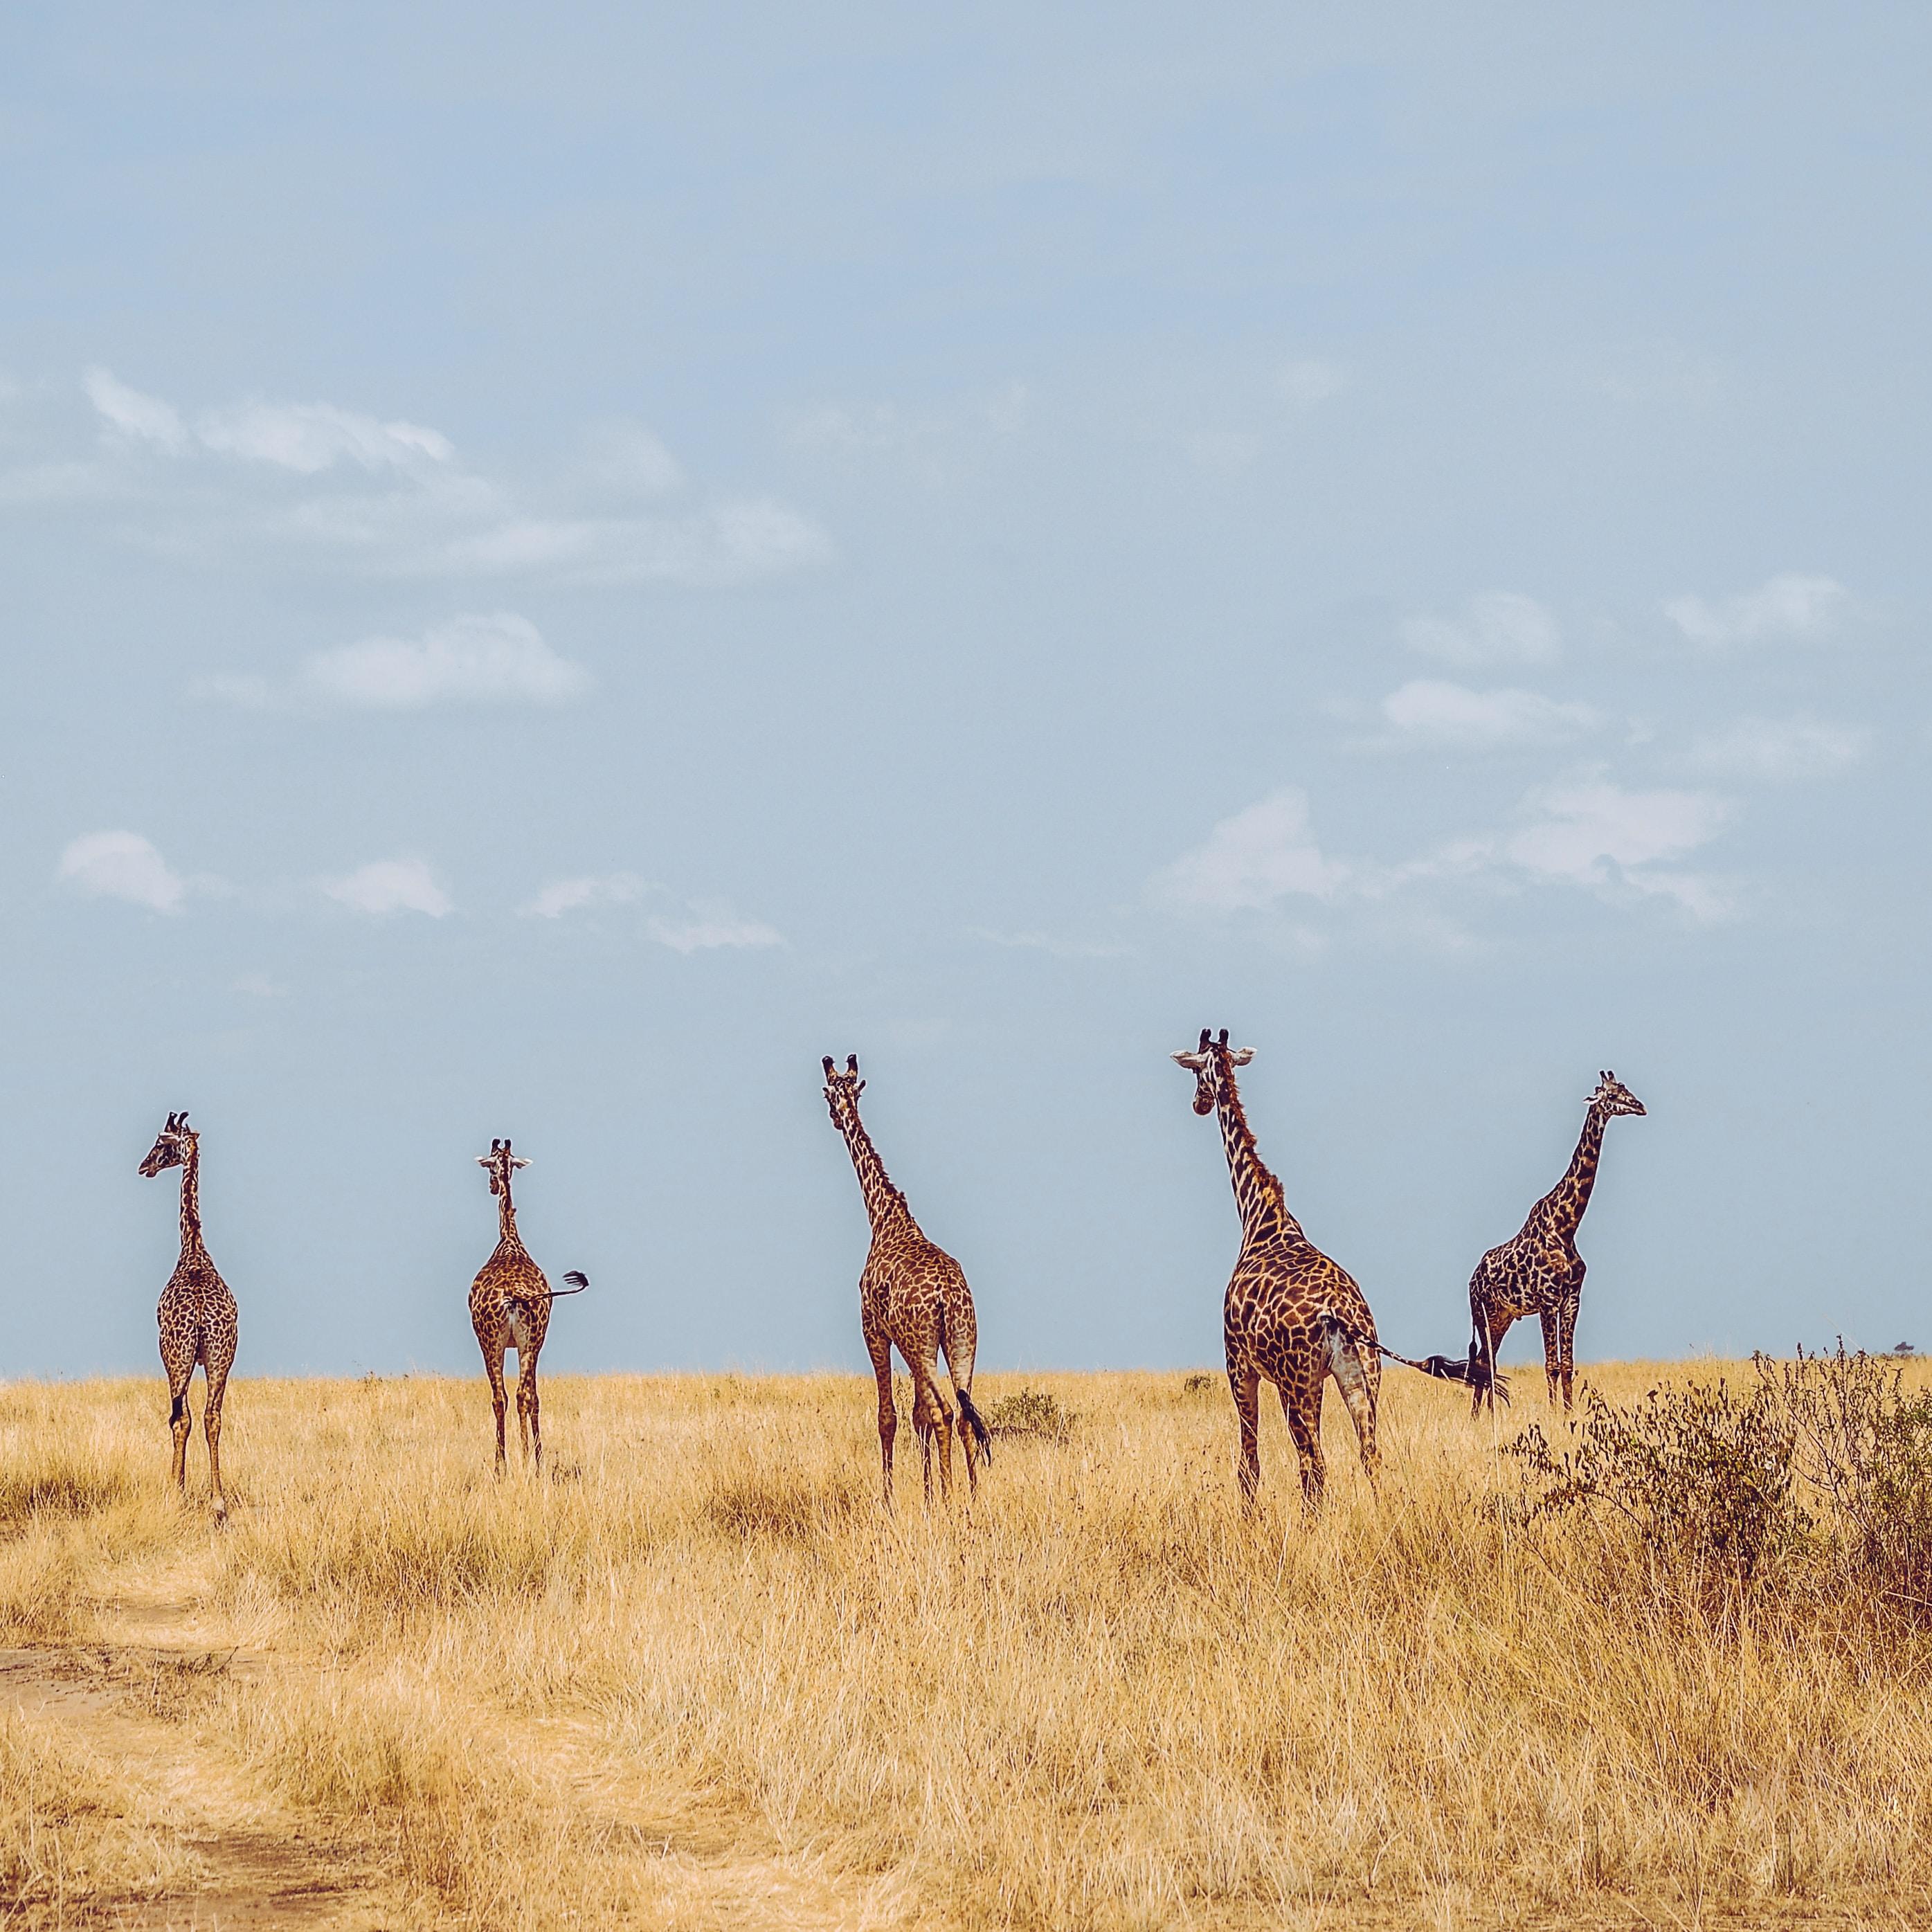 five giraffes on grass field during daytime